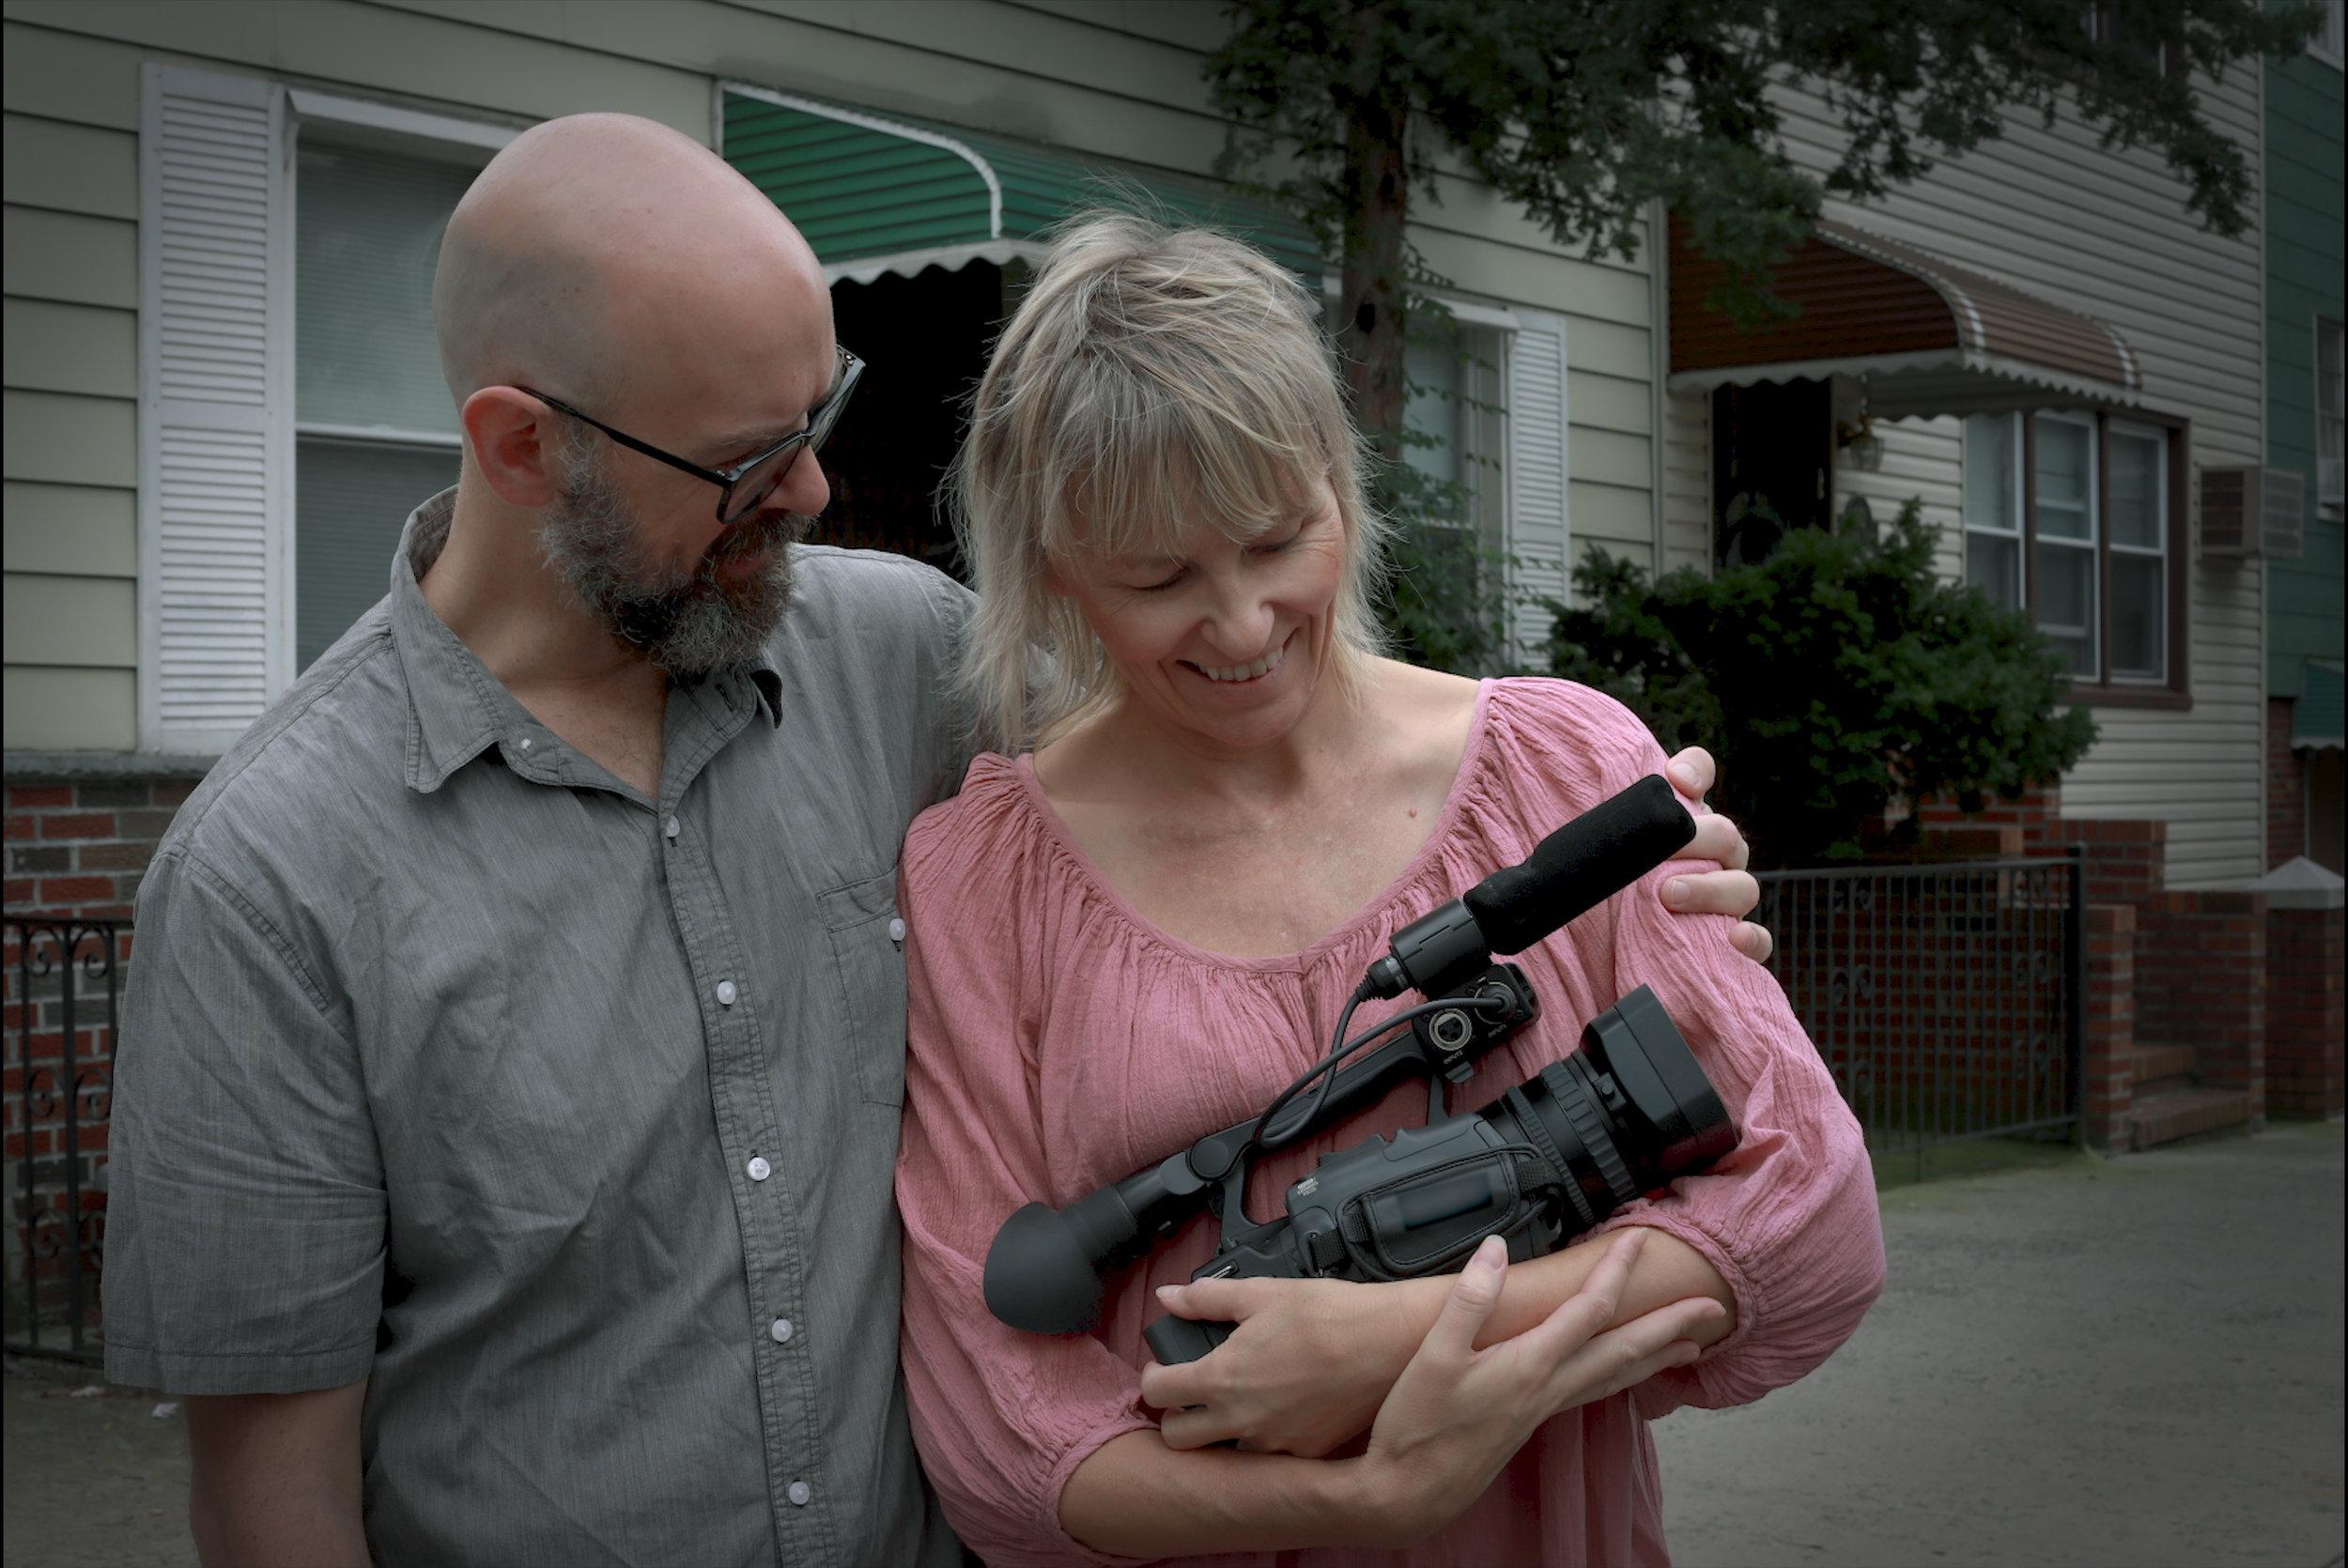 Maxine, husband Josh and camera